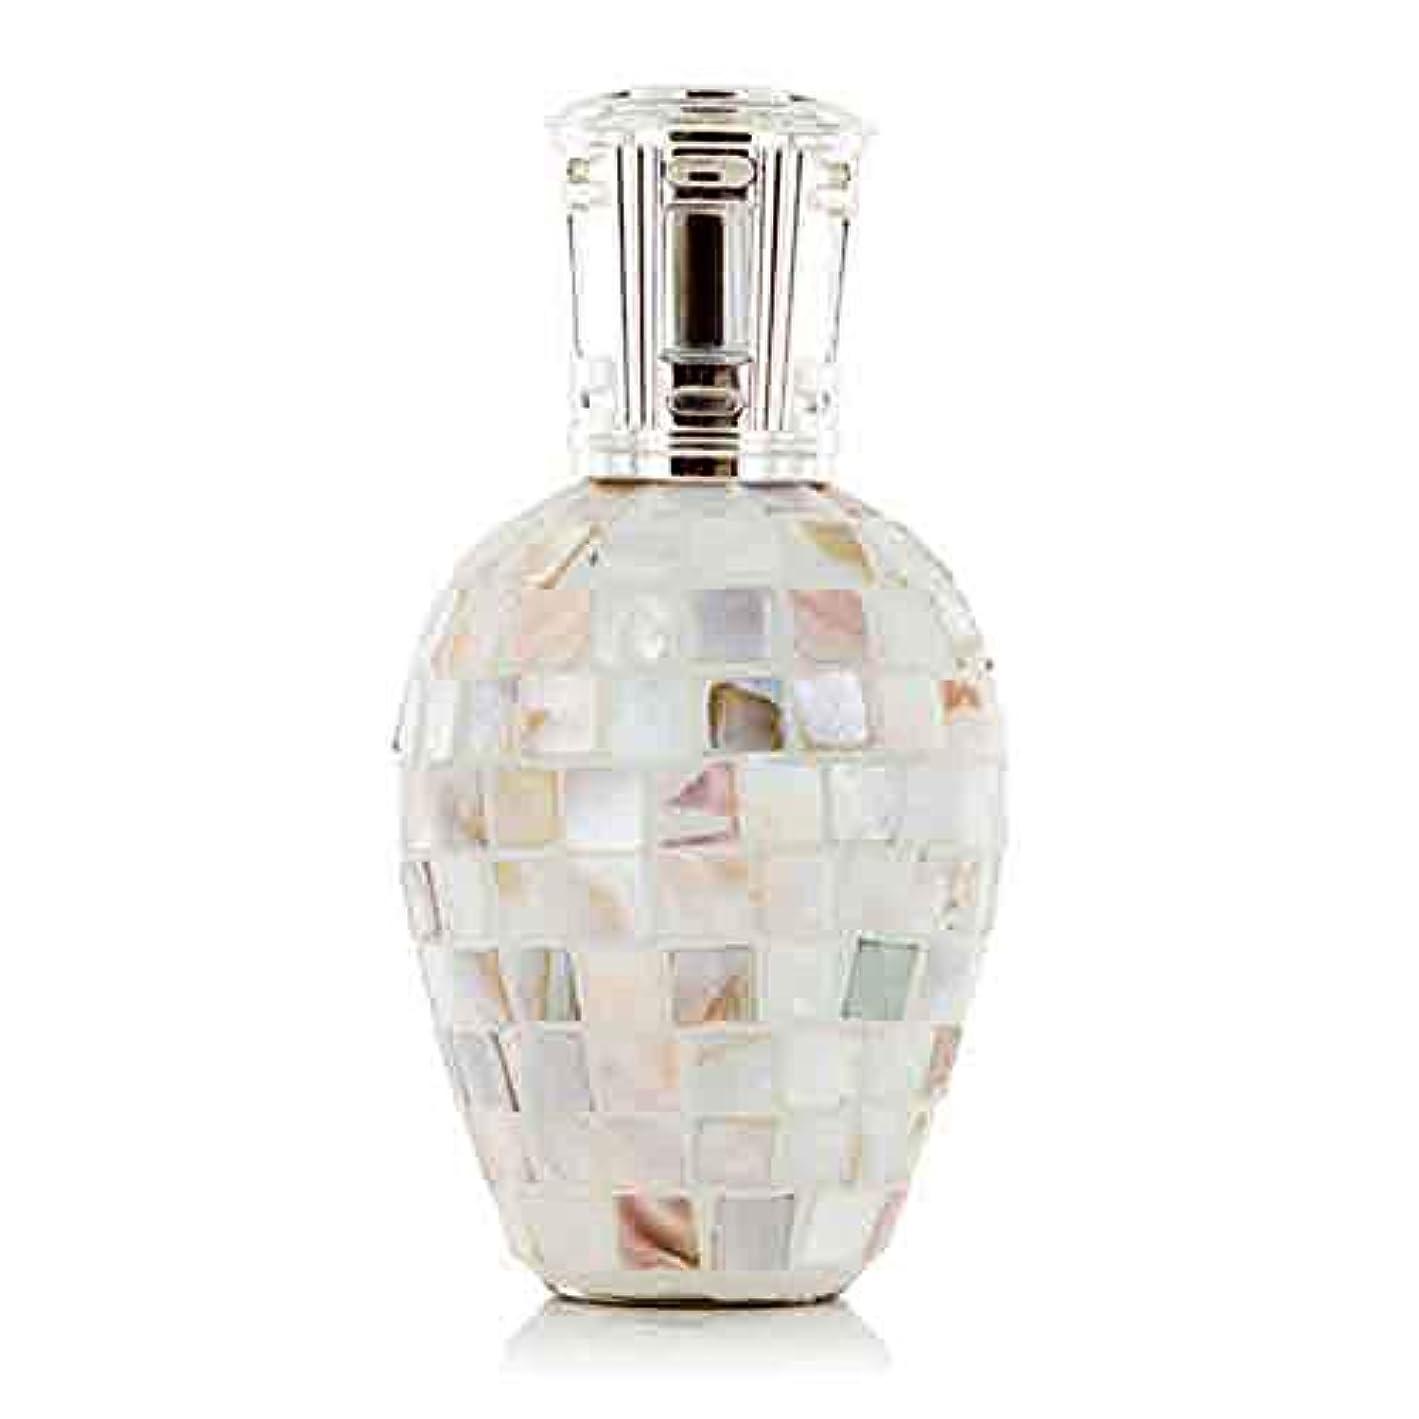 Ashleigh&Burwood フレグランスランプ L オーシャンキング FragranceLamps OceanKing アシュレイ&バーウッド